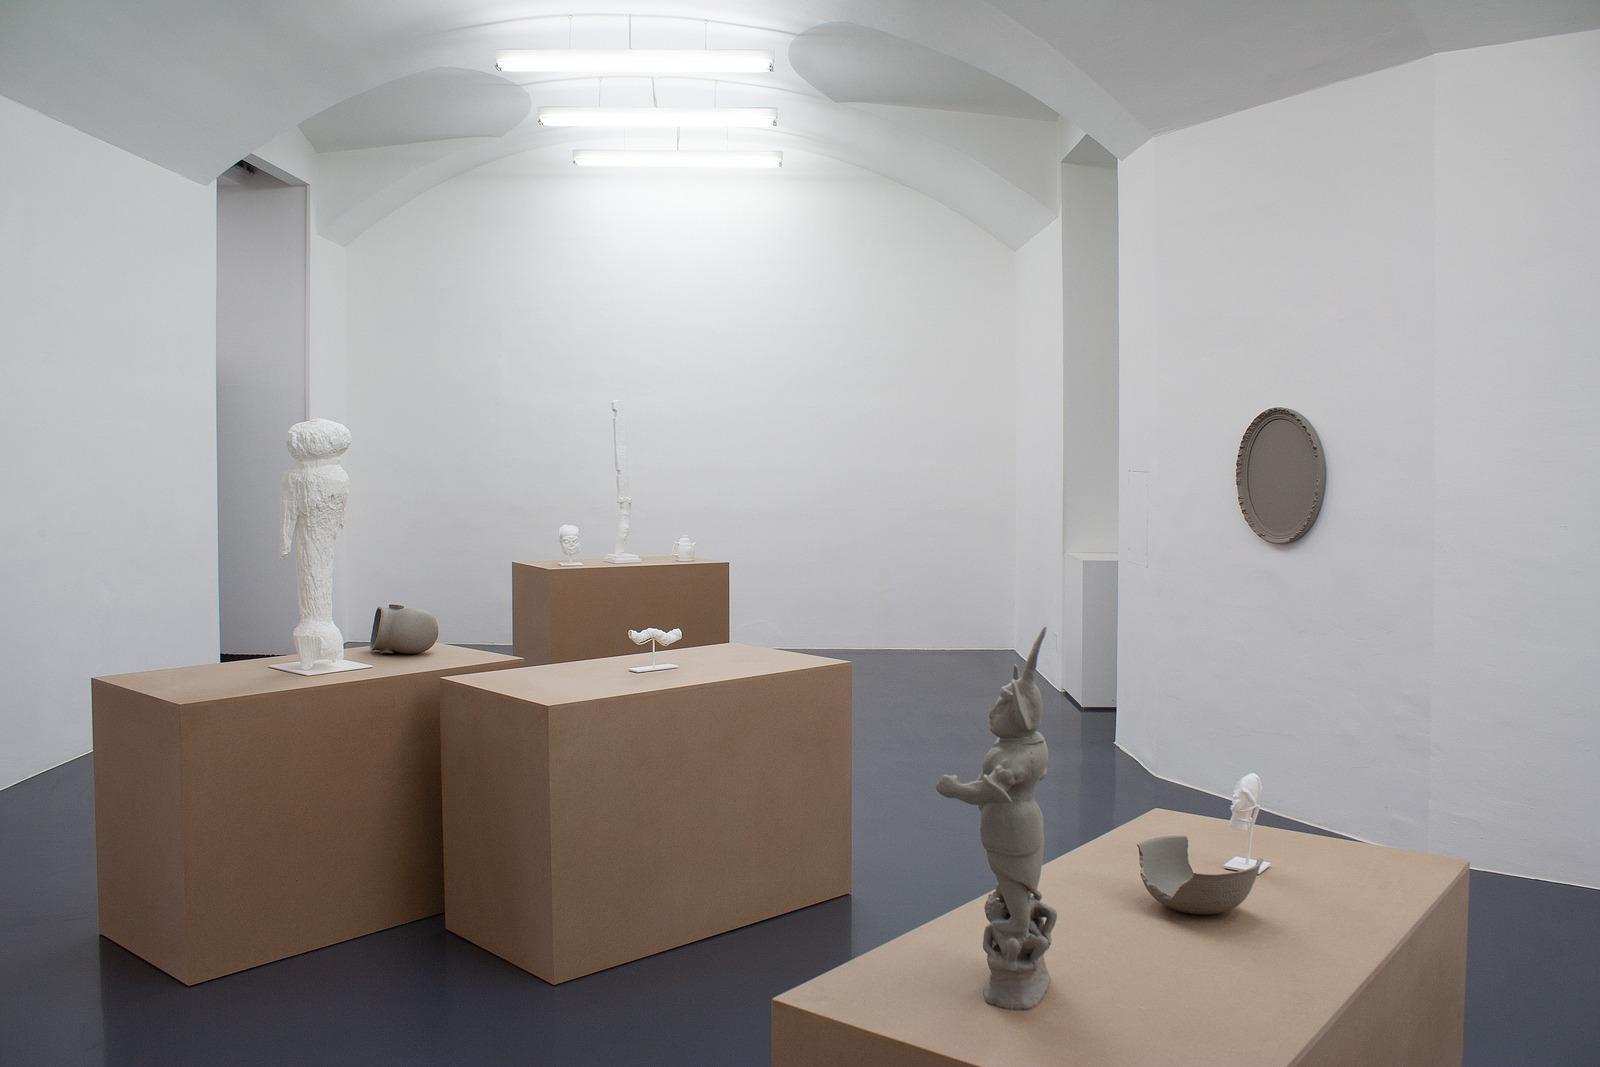 10 Gaylen Gerber exhibition Galerie Emanuel Layr Wien 2016 IMG_8518